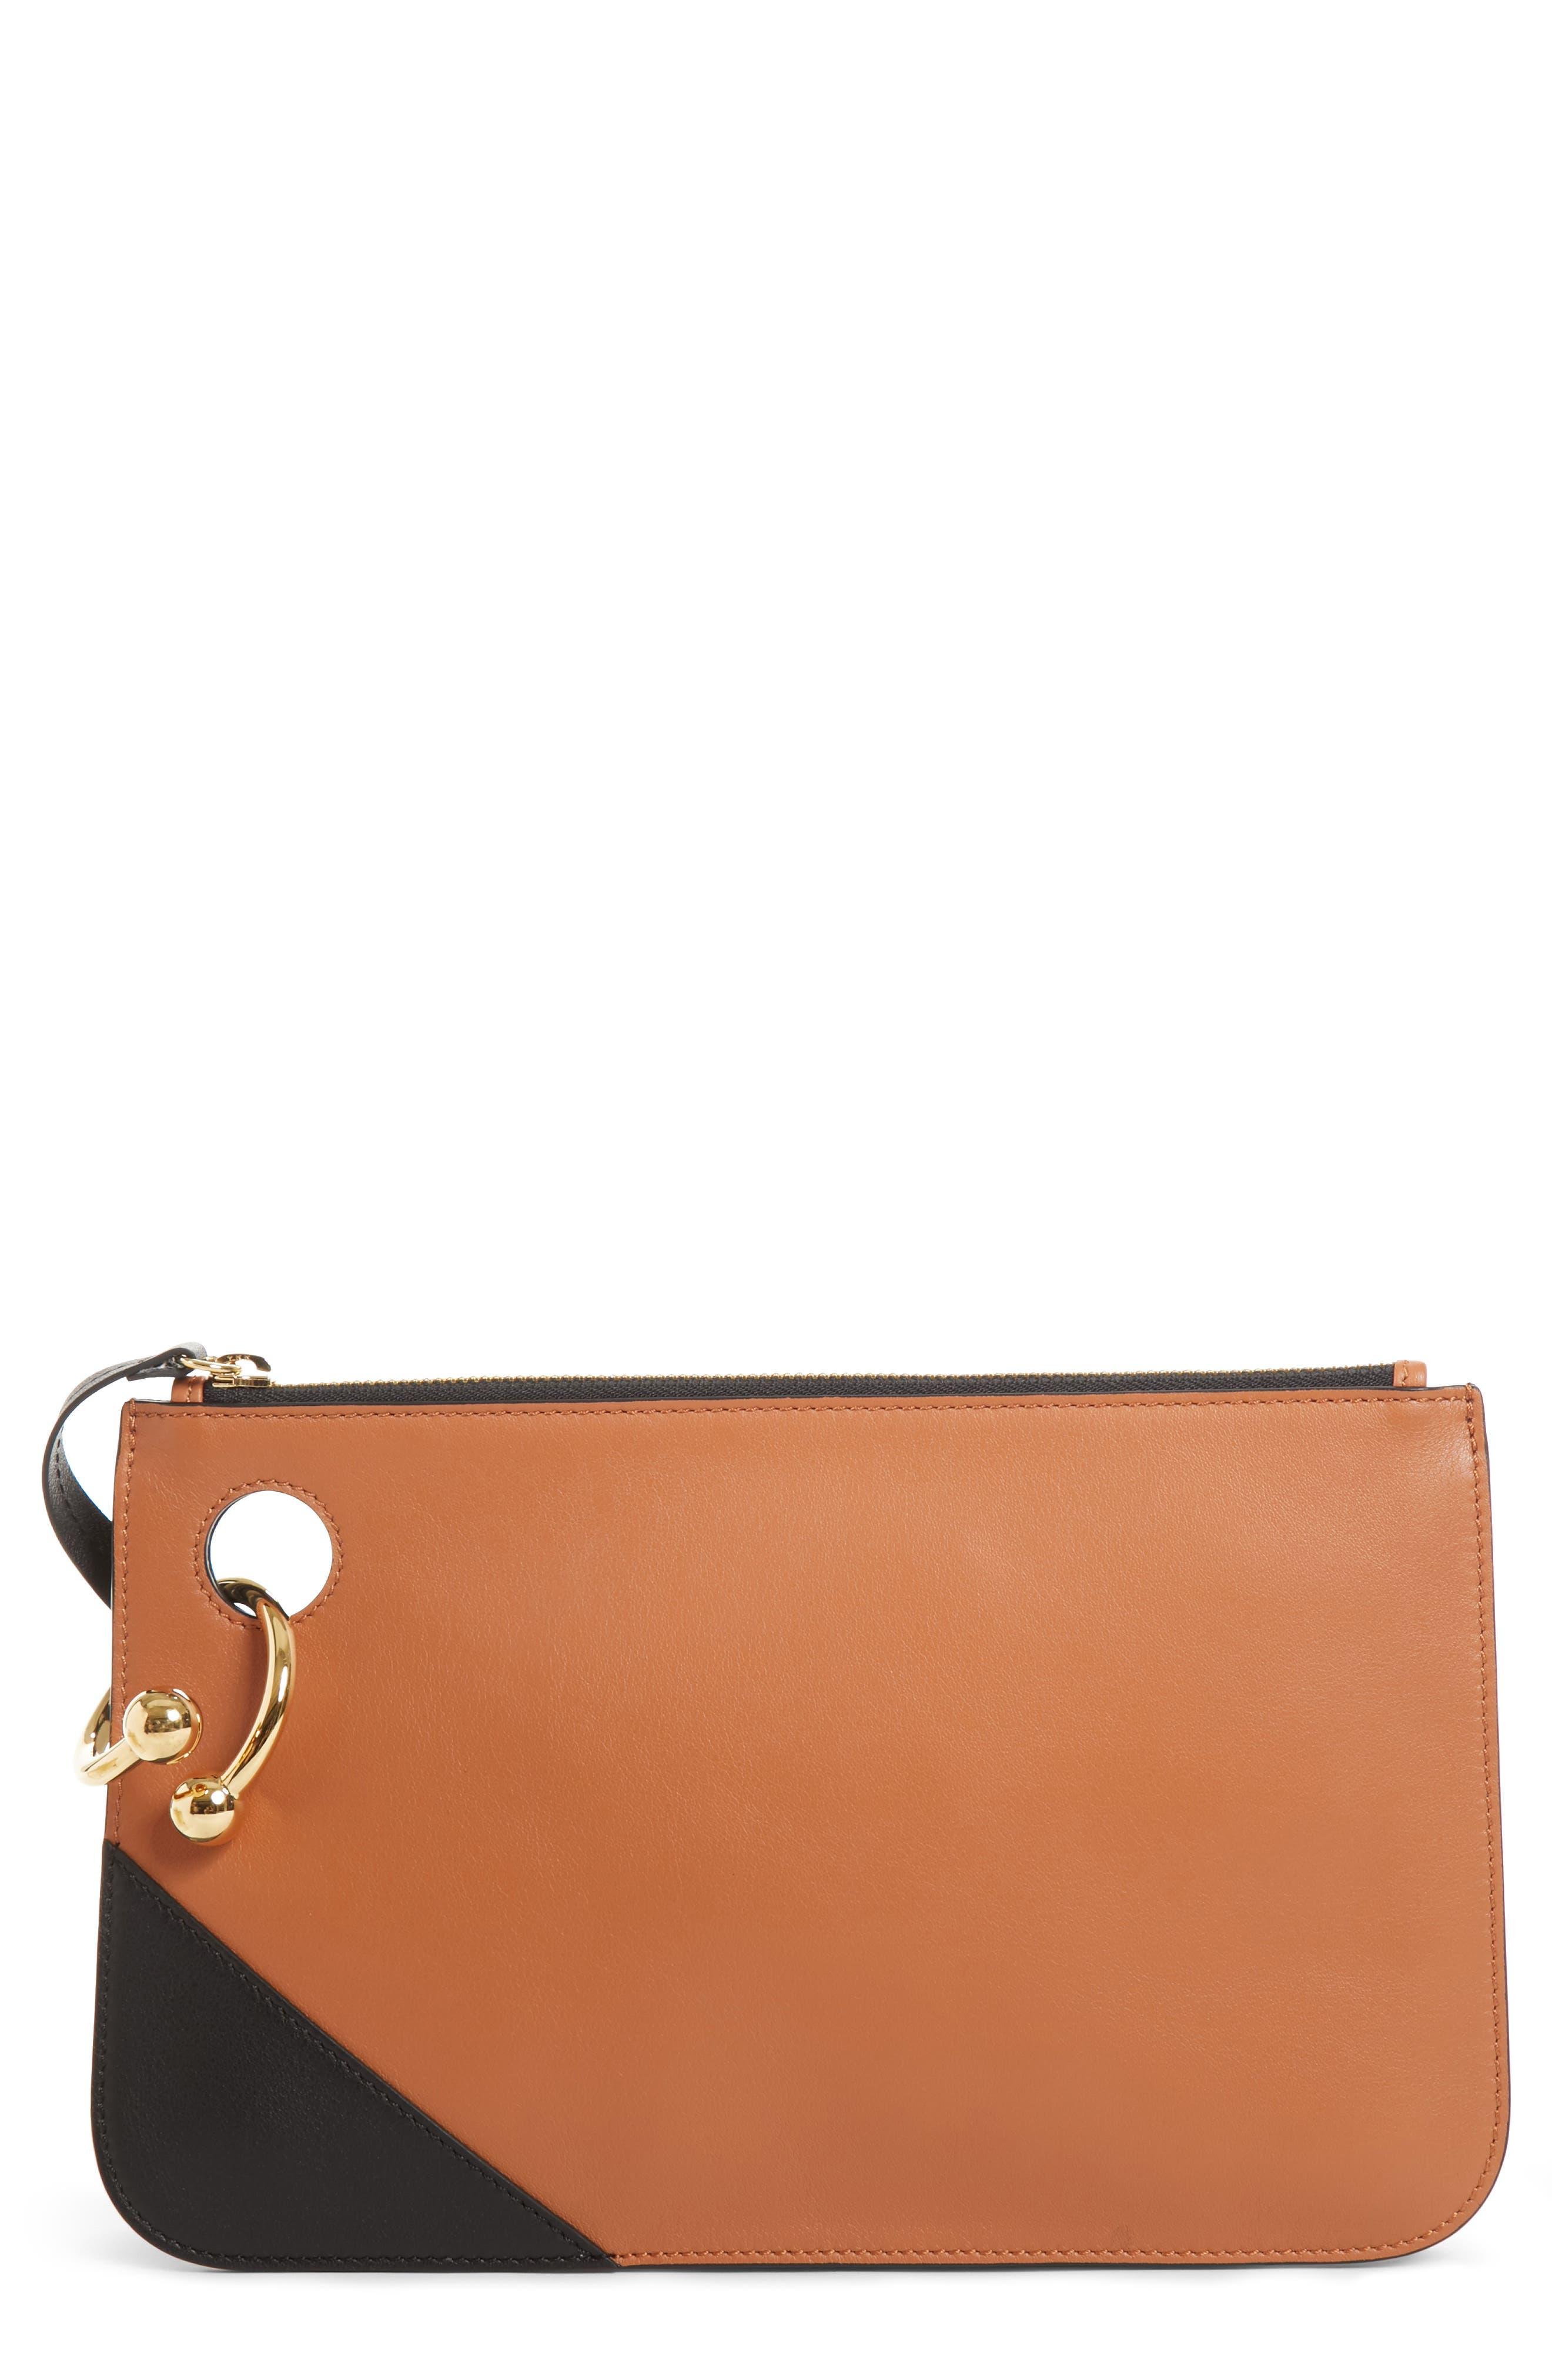 J.W.ANDERSON Pierce Colorblock Leather Clutch,                         Main,                         color, 240